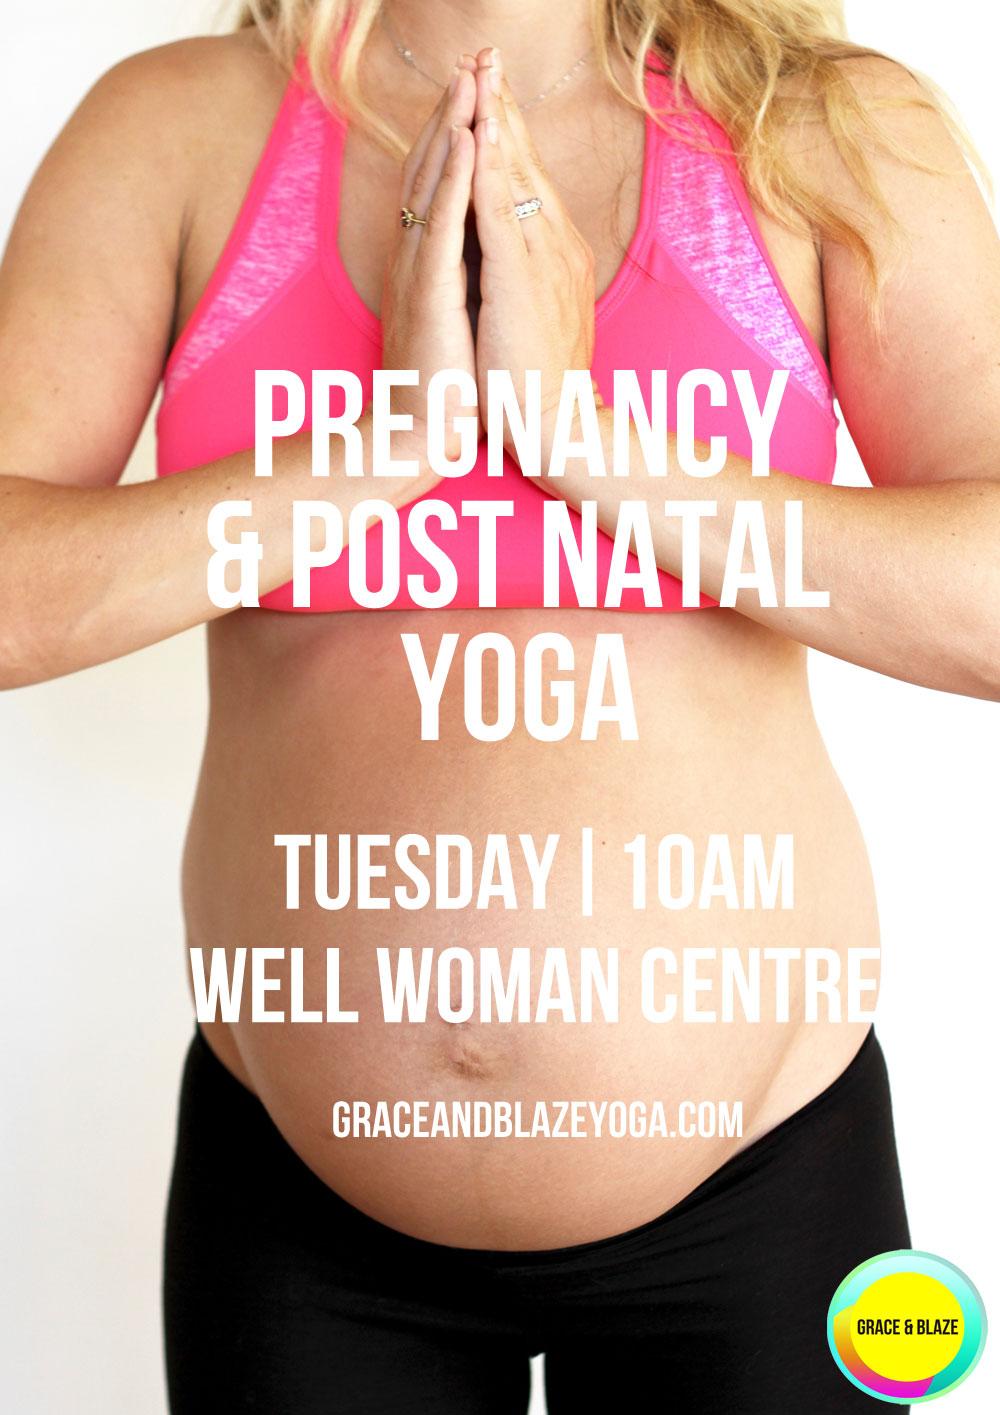 Pregnancy&PostNatalYoga_WellWoman_Online copy.jpg